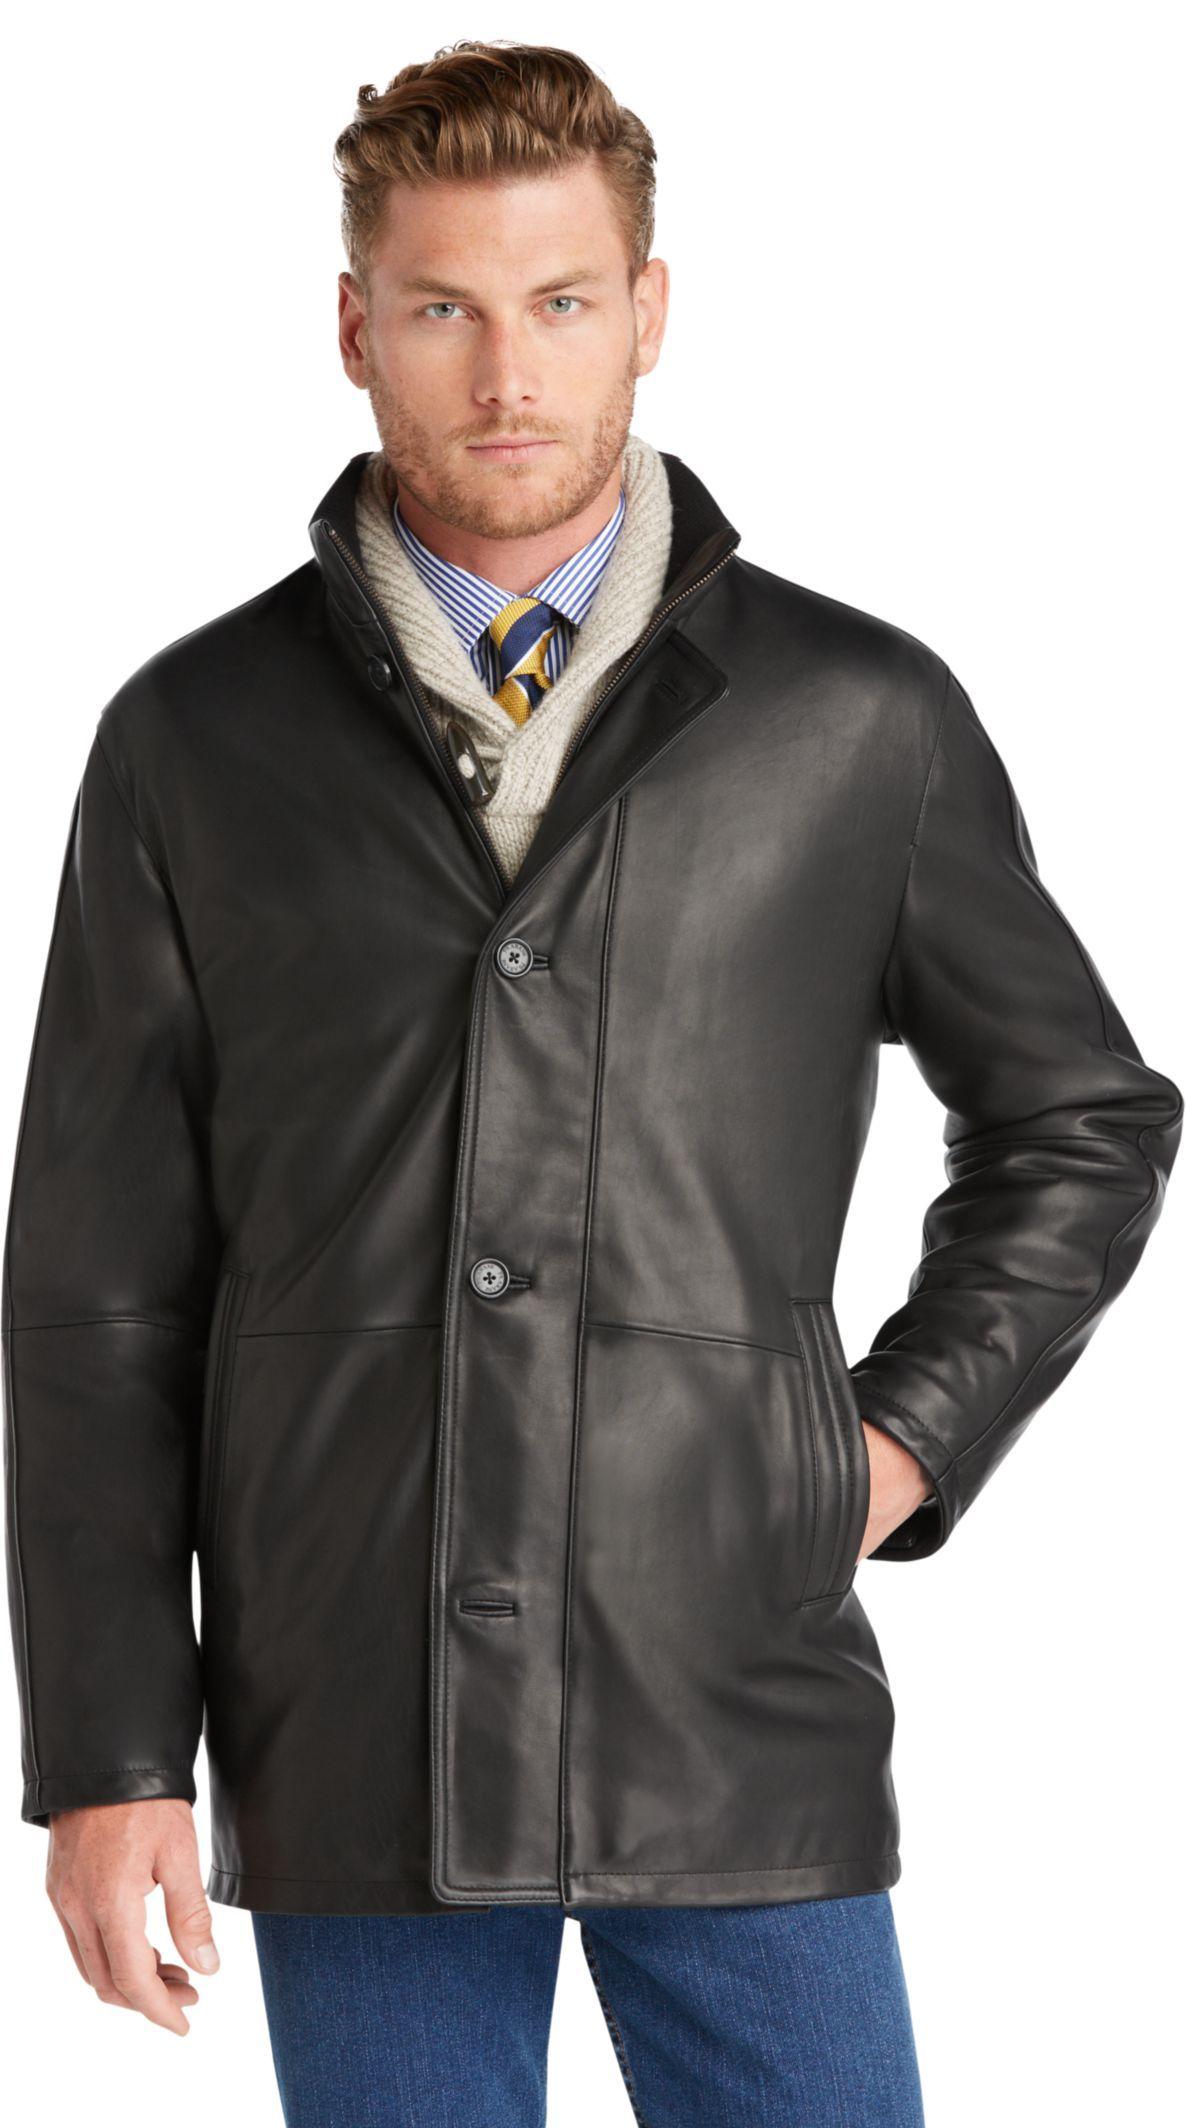 Signature 3/4 Length Leather Car Coat Mens leather